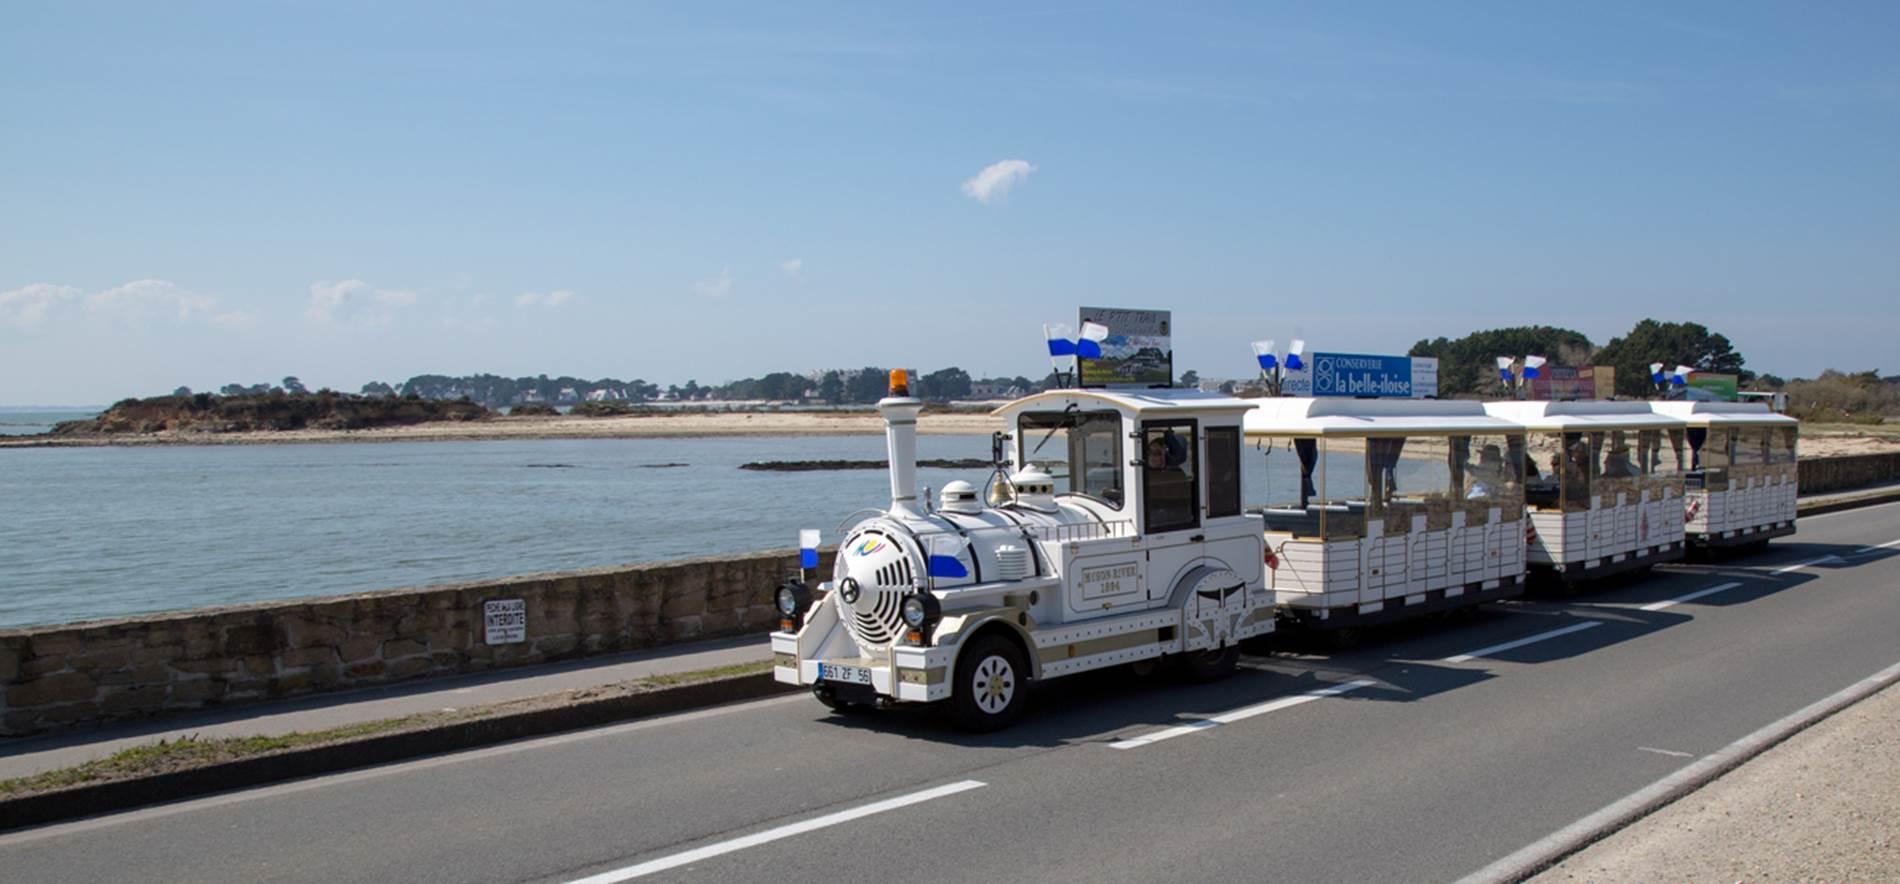 Petit-train-touristique-Carnac-Morbihan-Bretagne-Sud © Le Bayon